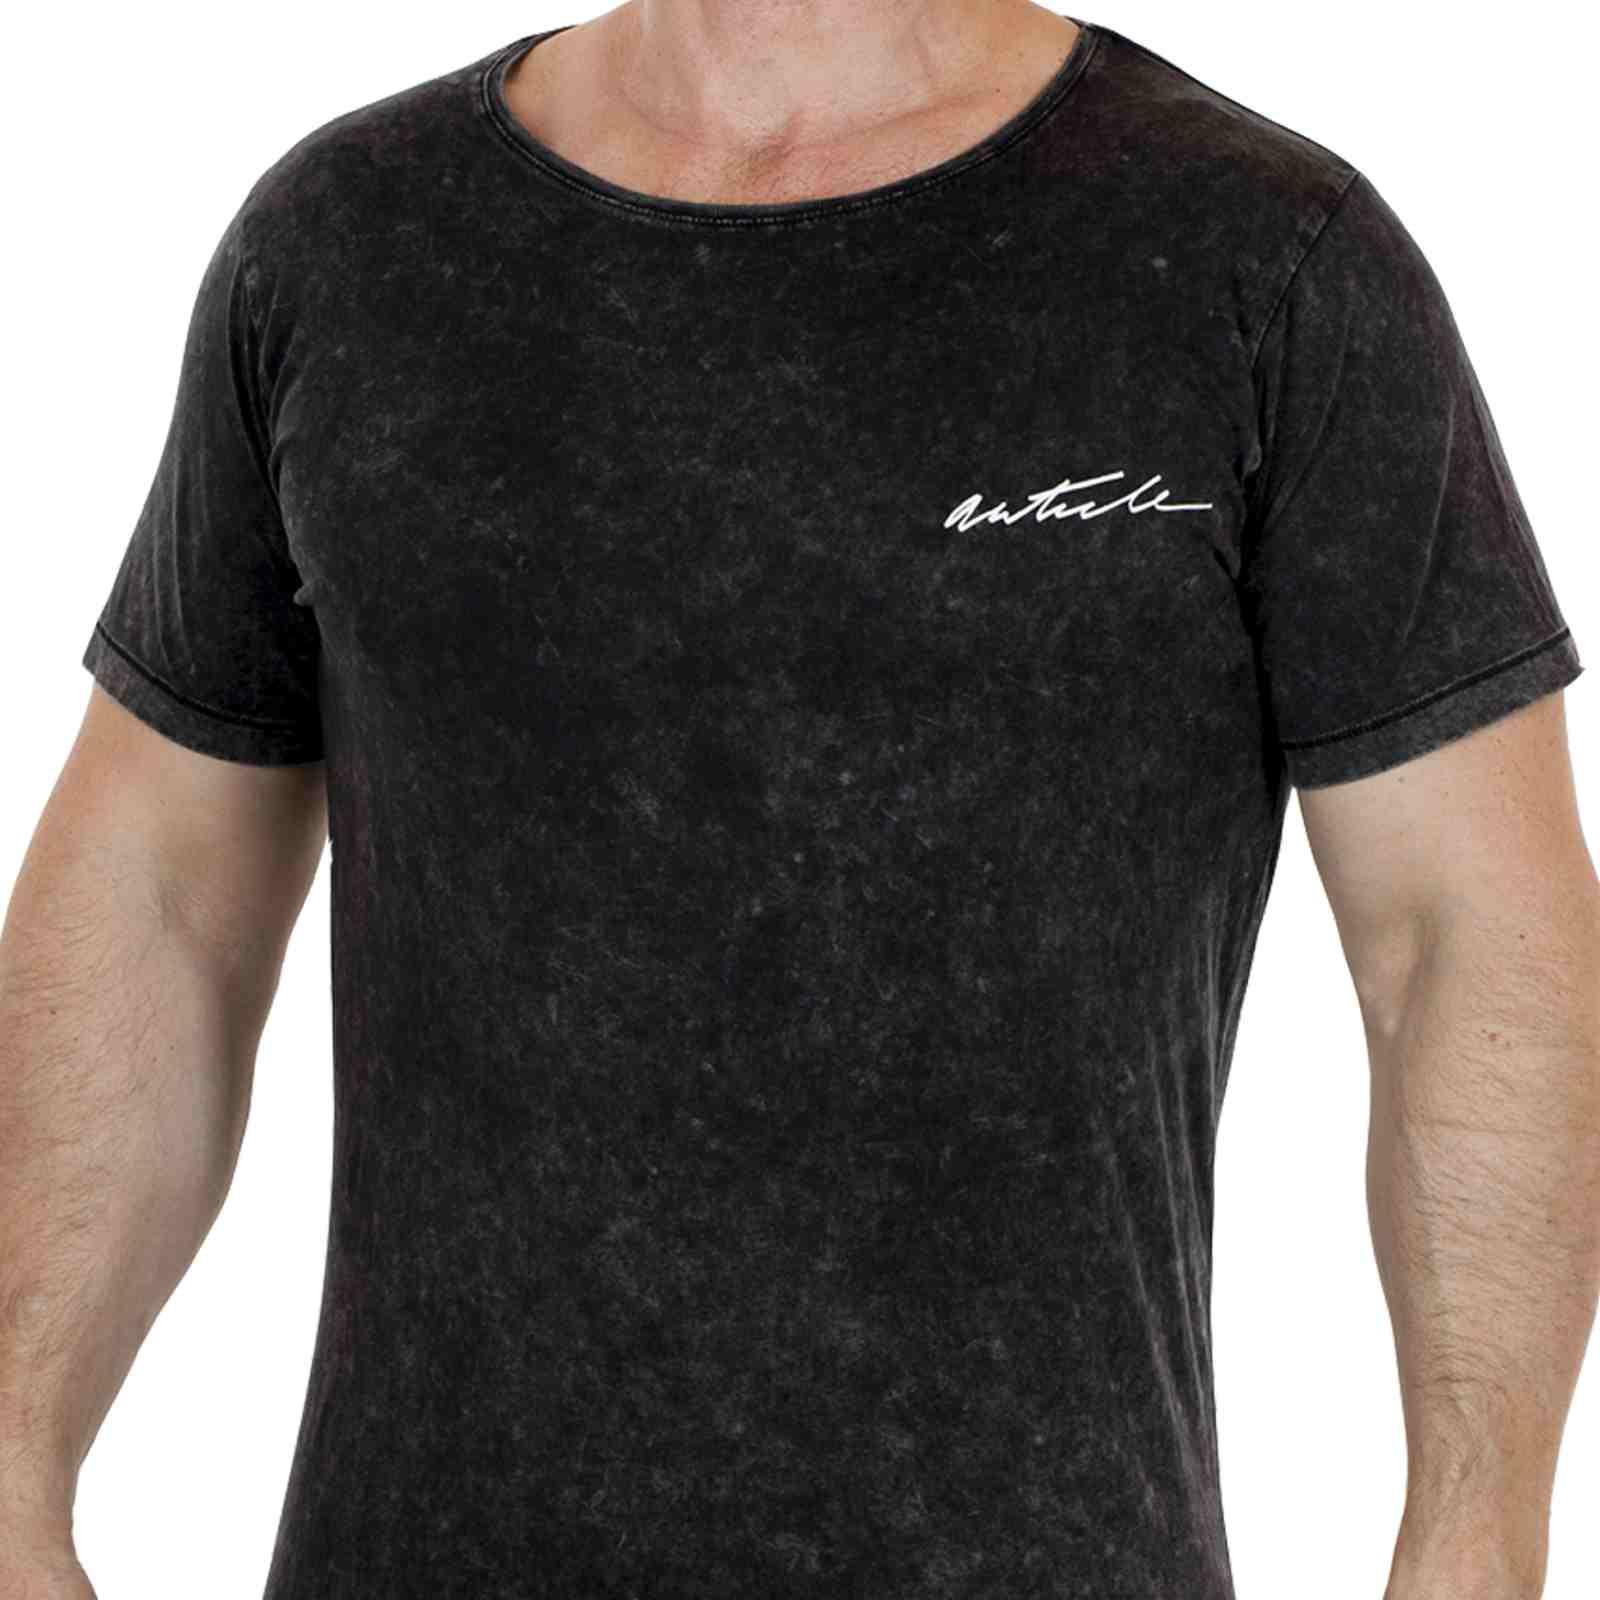 Дизайнерская мужская футболка ARTICLE-главная